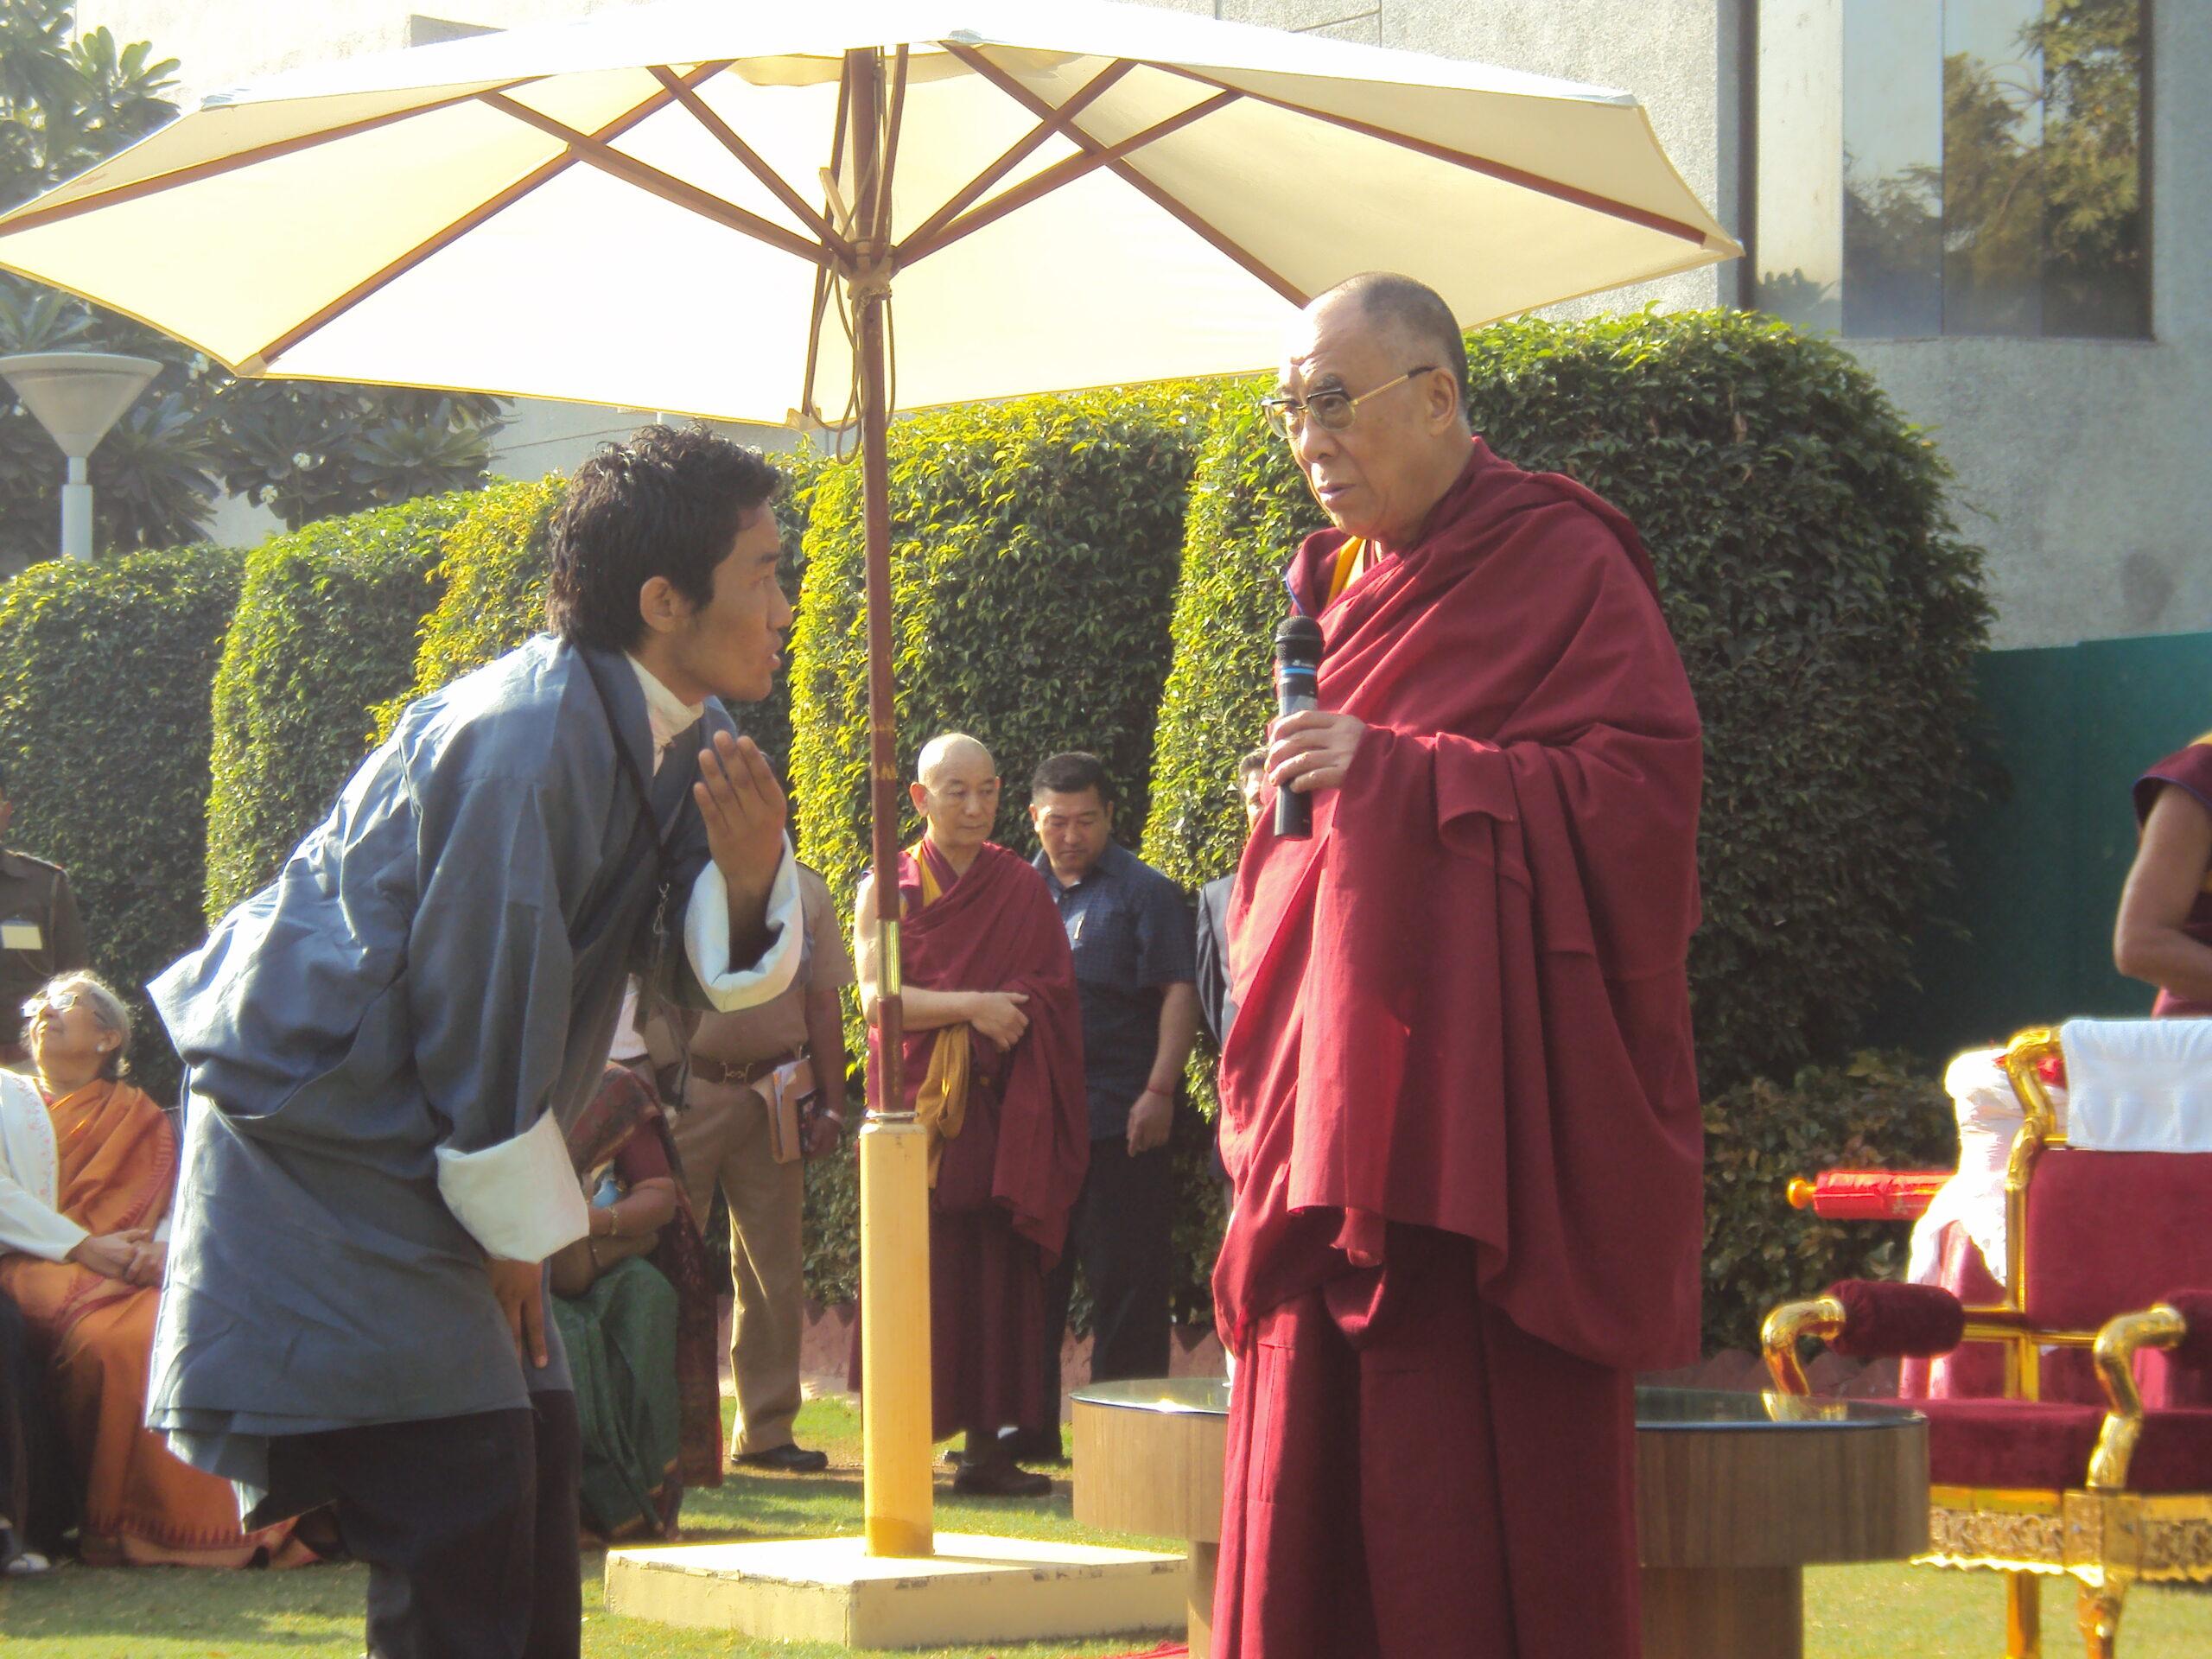 Nyima Gyaltsen, as the president of RTYC Baroda, receives His Holiness the Great 14th Dalai Lama of Tibet, Baroda, Gujarat,2010.